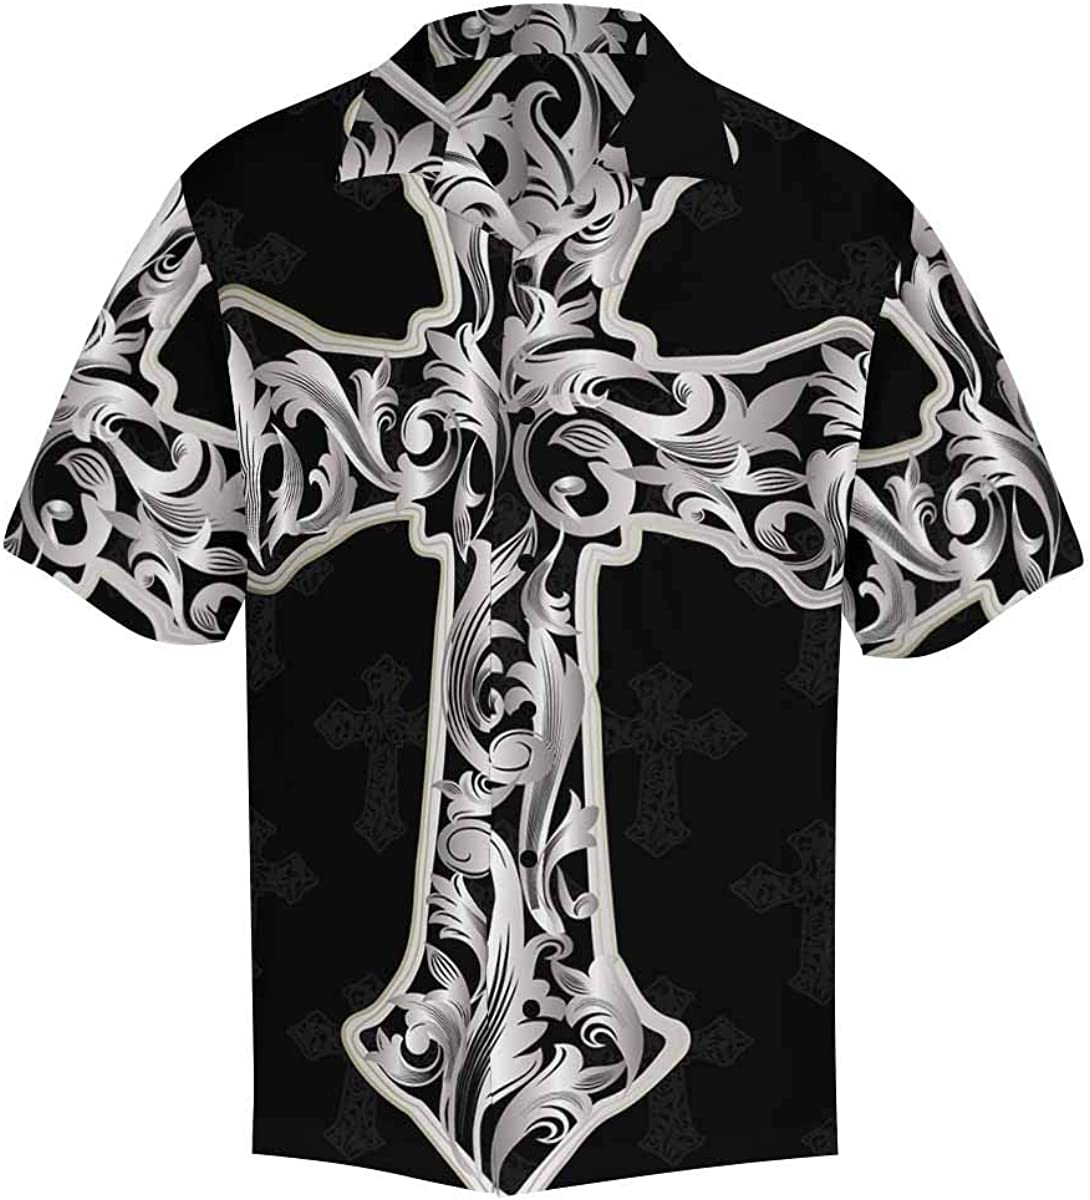 InterestPrint Men's Casual Button Down Short Sleeve Vintage Dandelion Hawaiian Shirt (S-5XL)